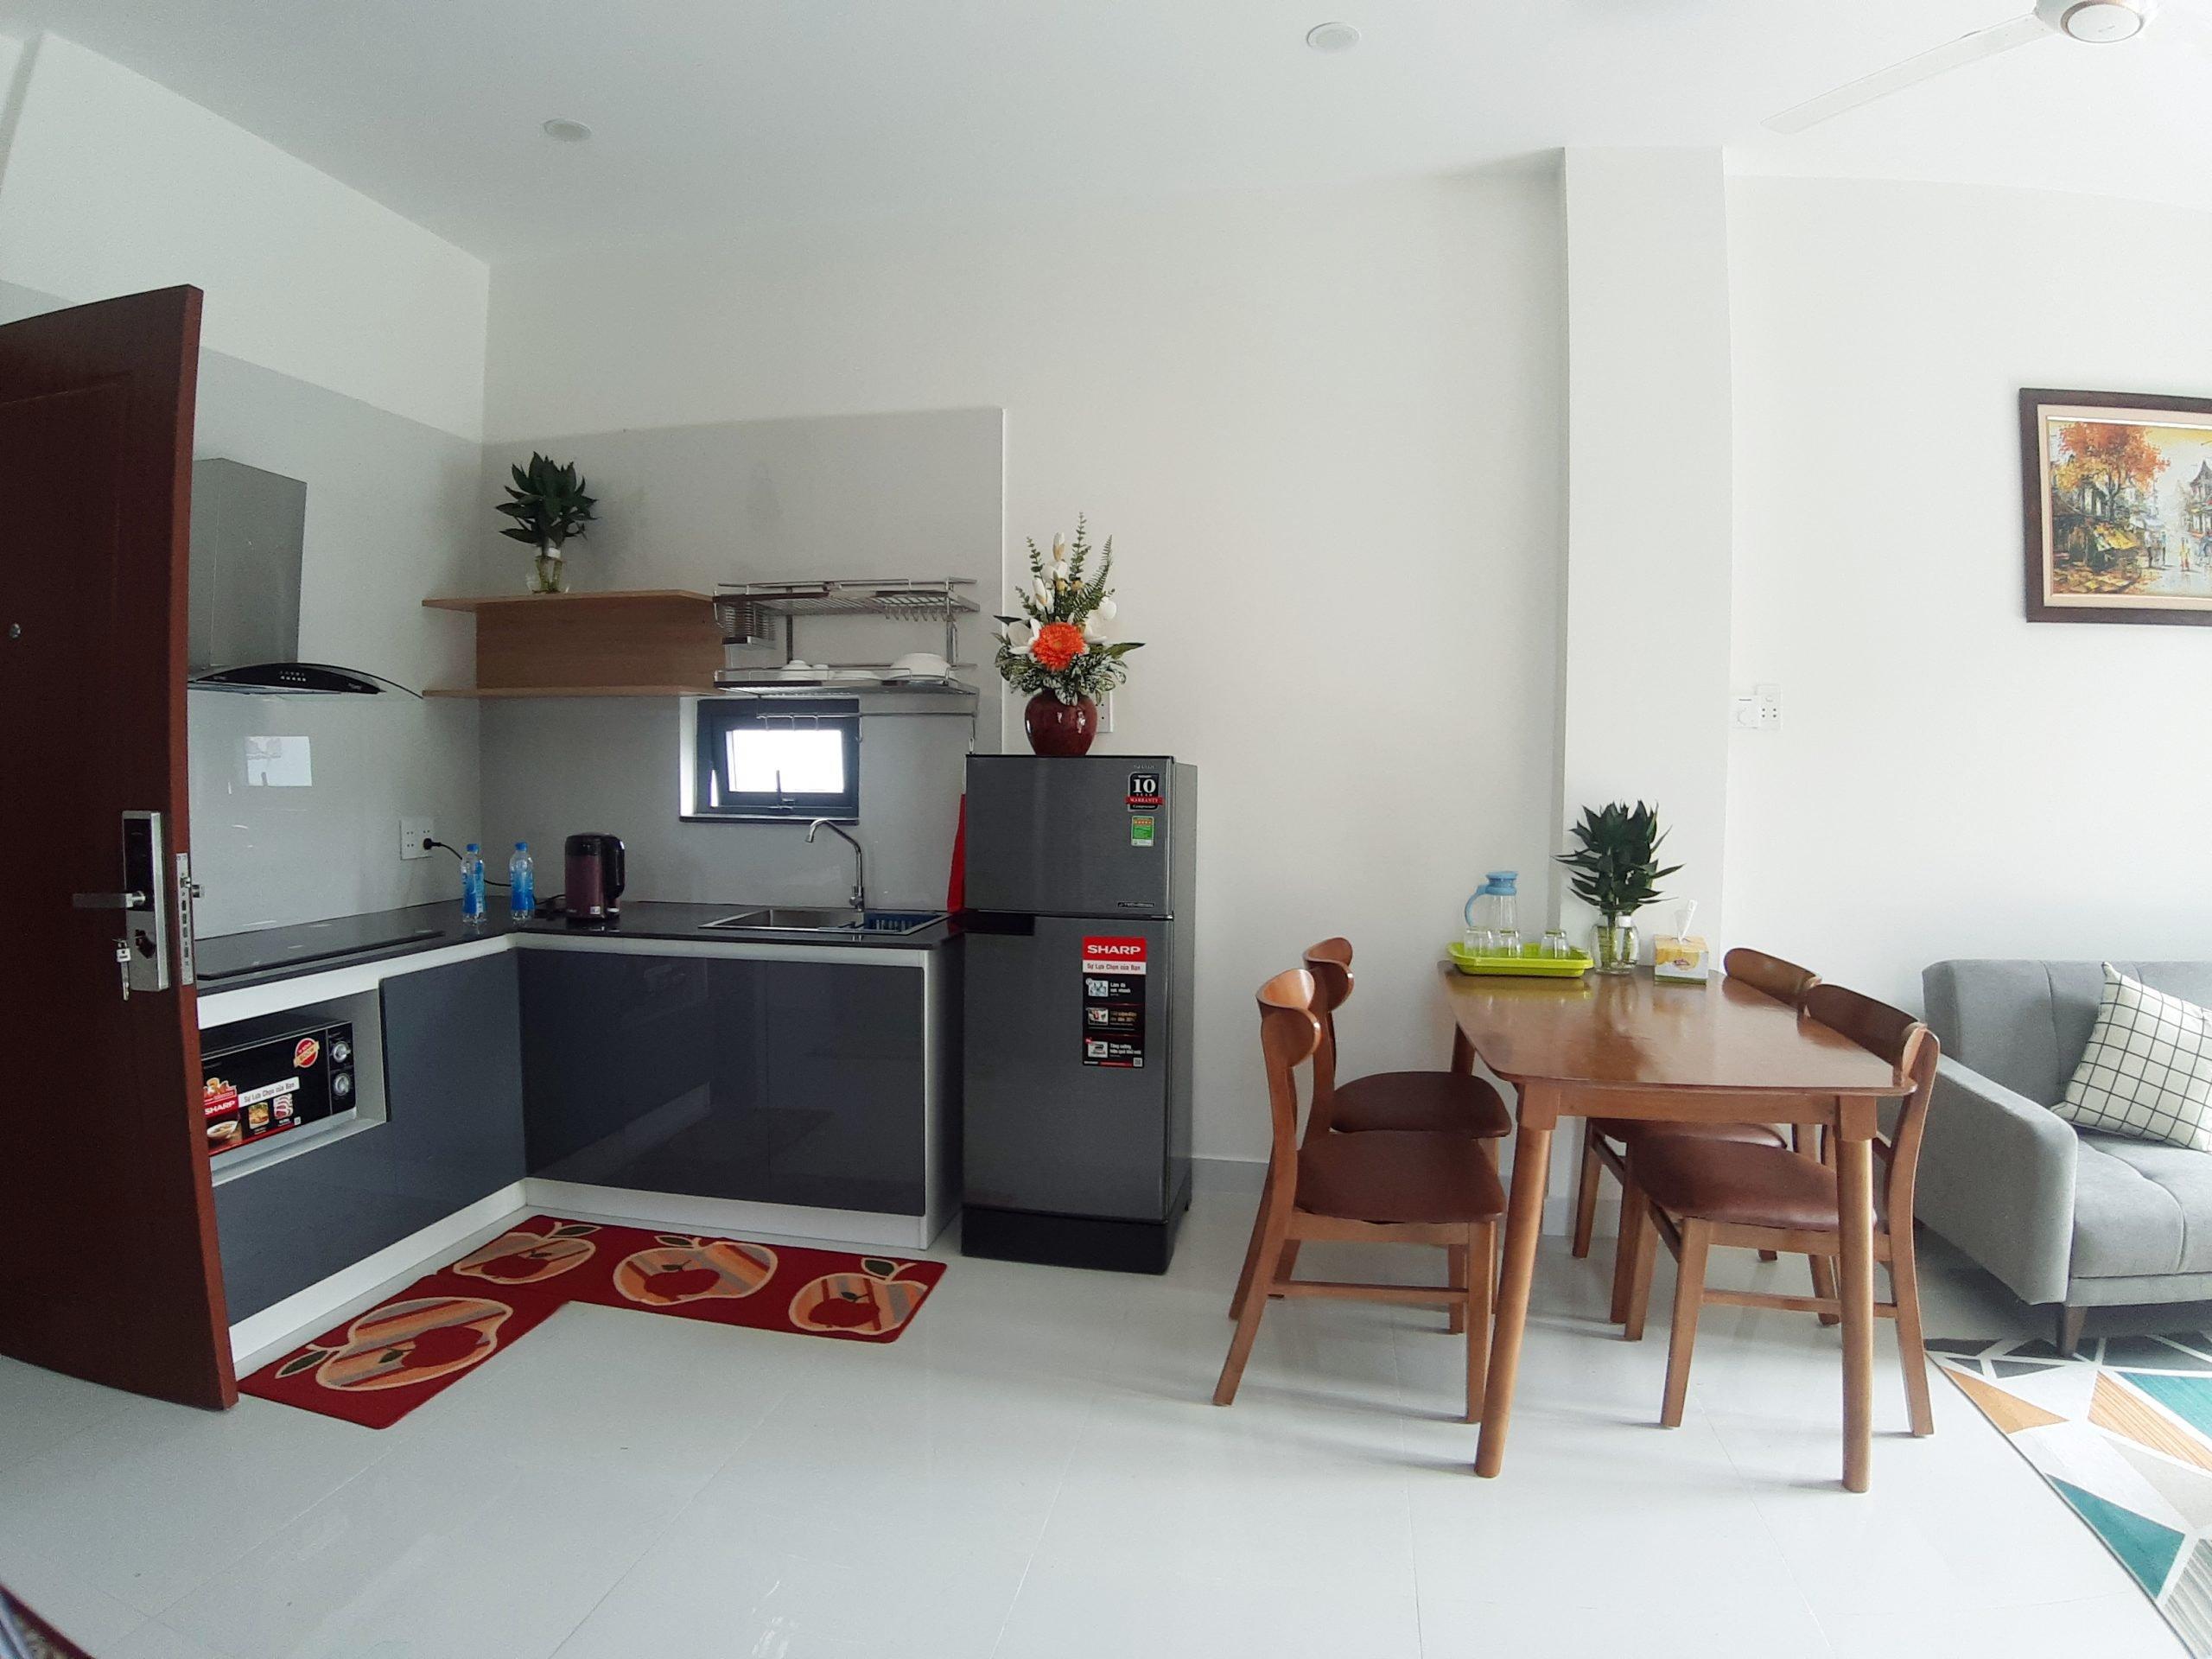 2 bedroom apartment for rent nearby Tran Thi Ly bridge Da Nang